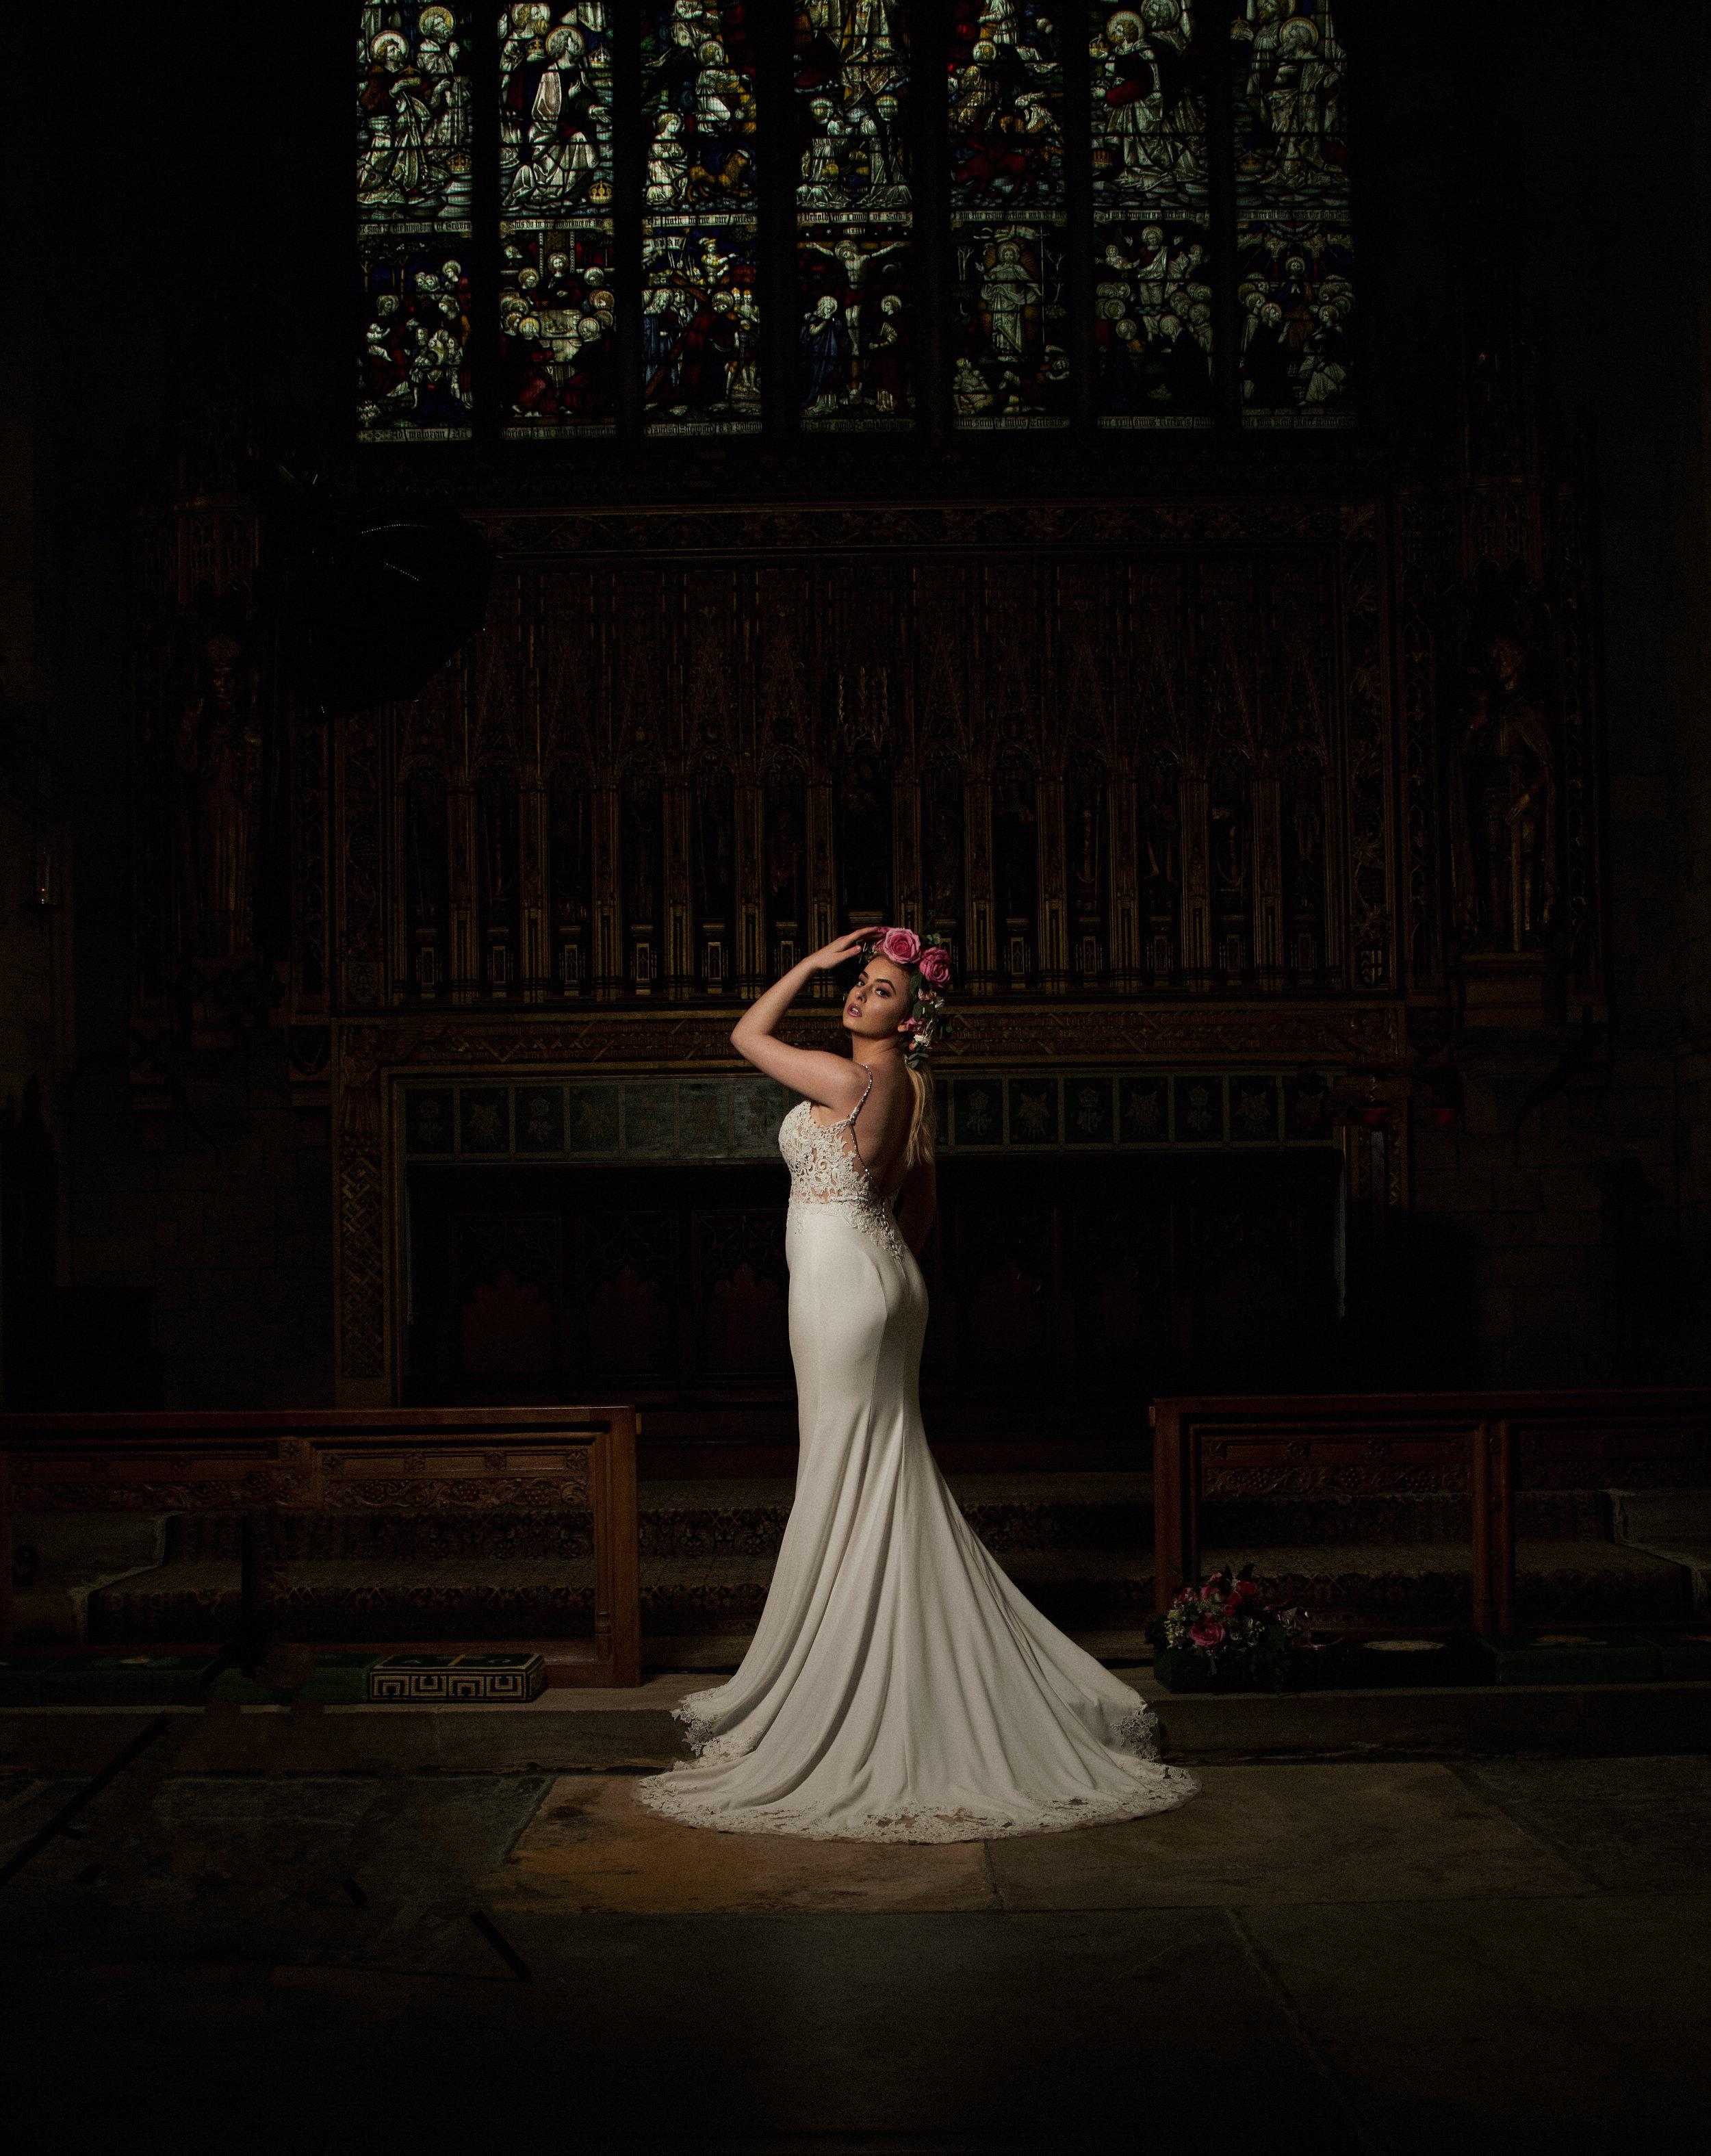 Lincolnshire wedding photohrapher